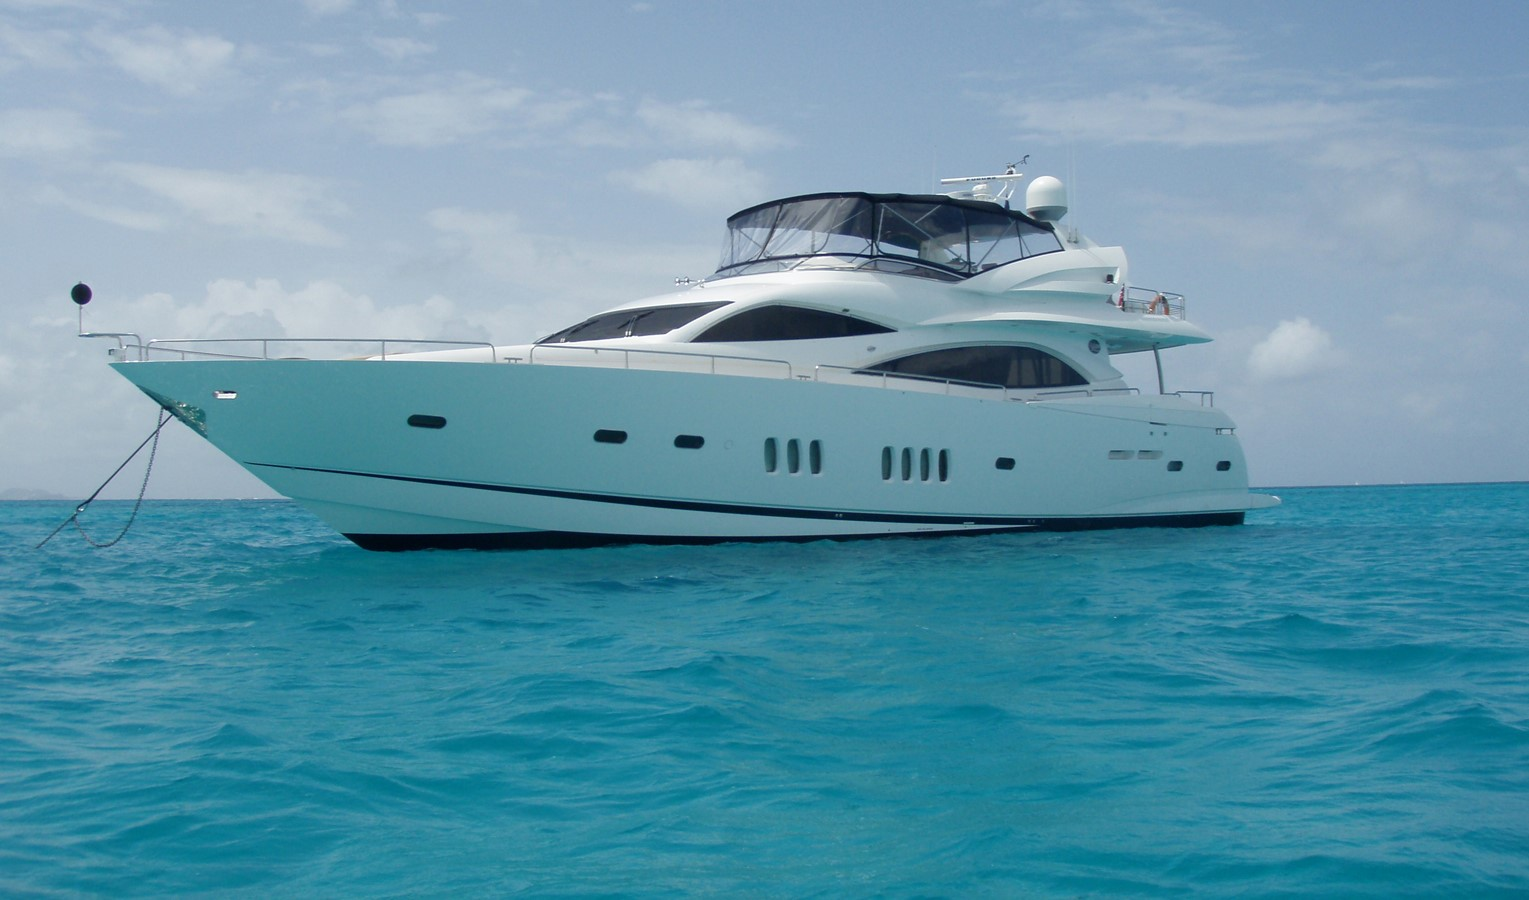 2006 SUNSEEKER 90 Yacht For Sale